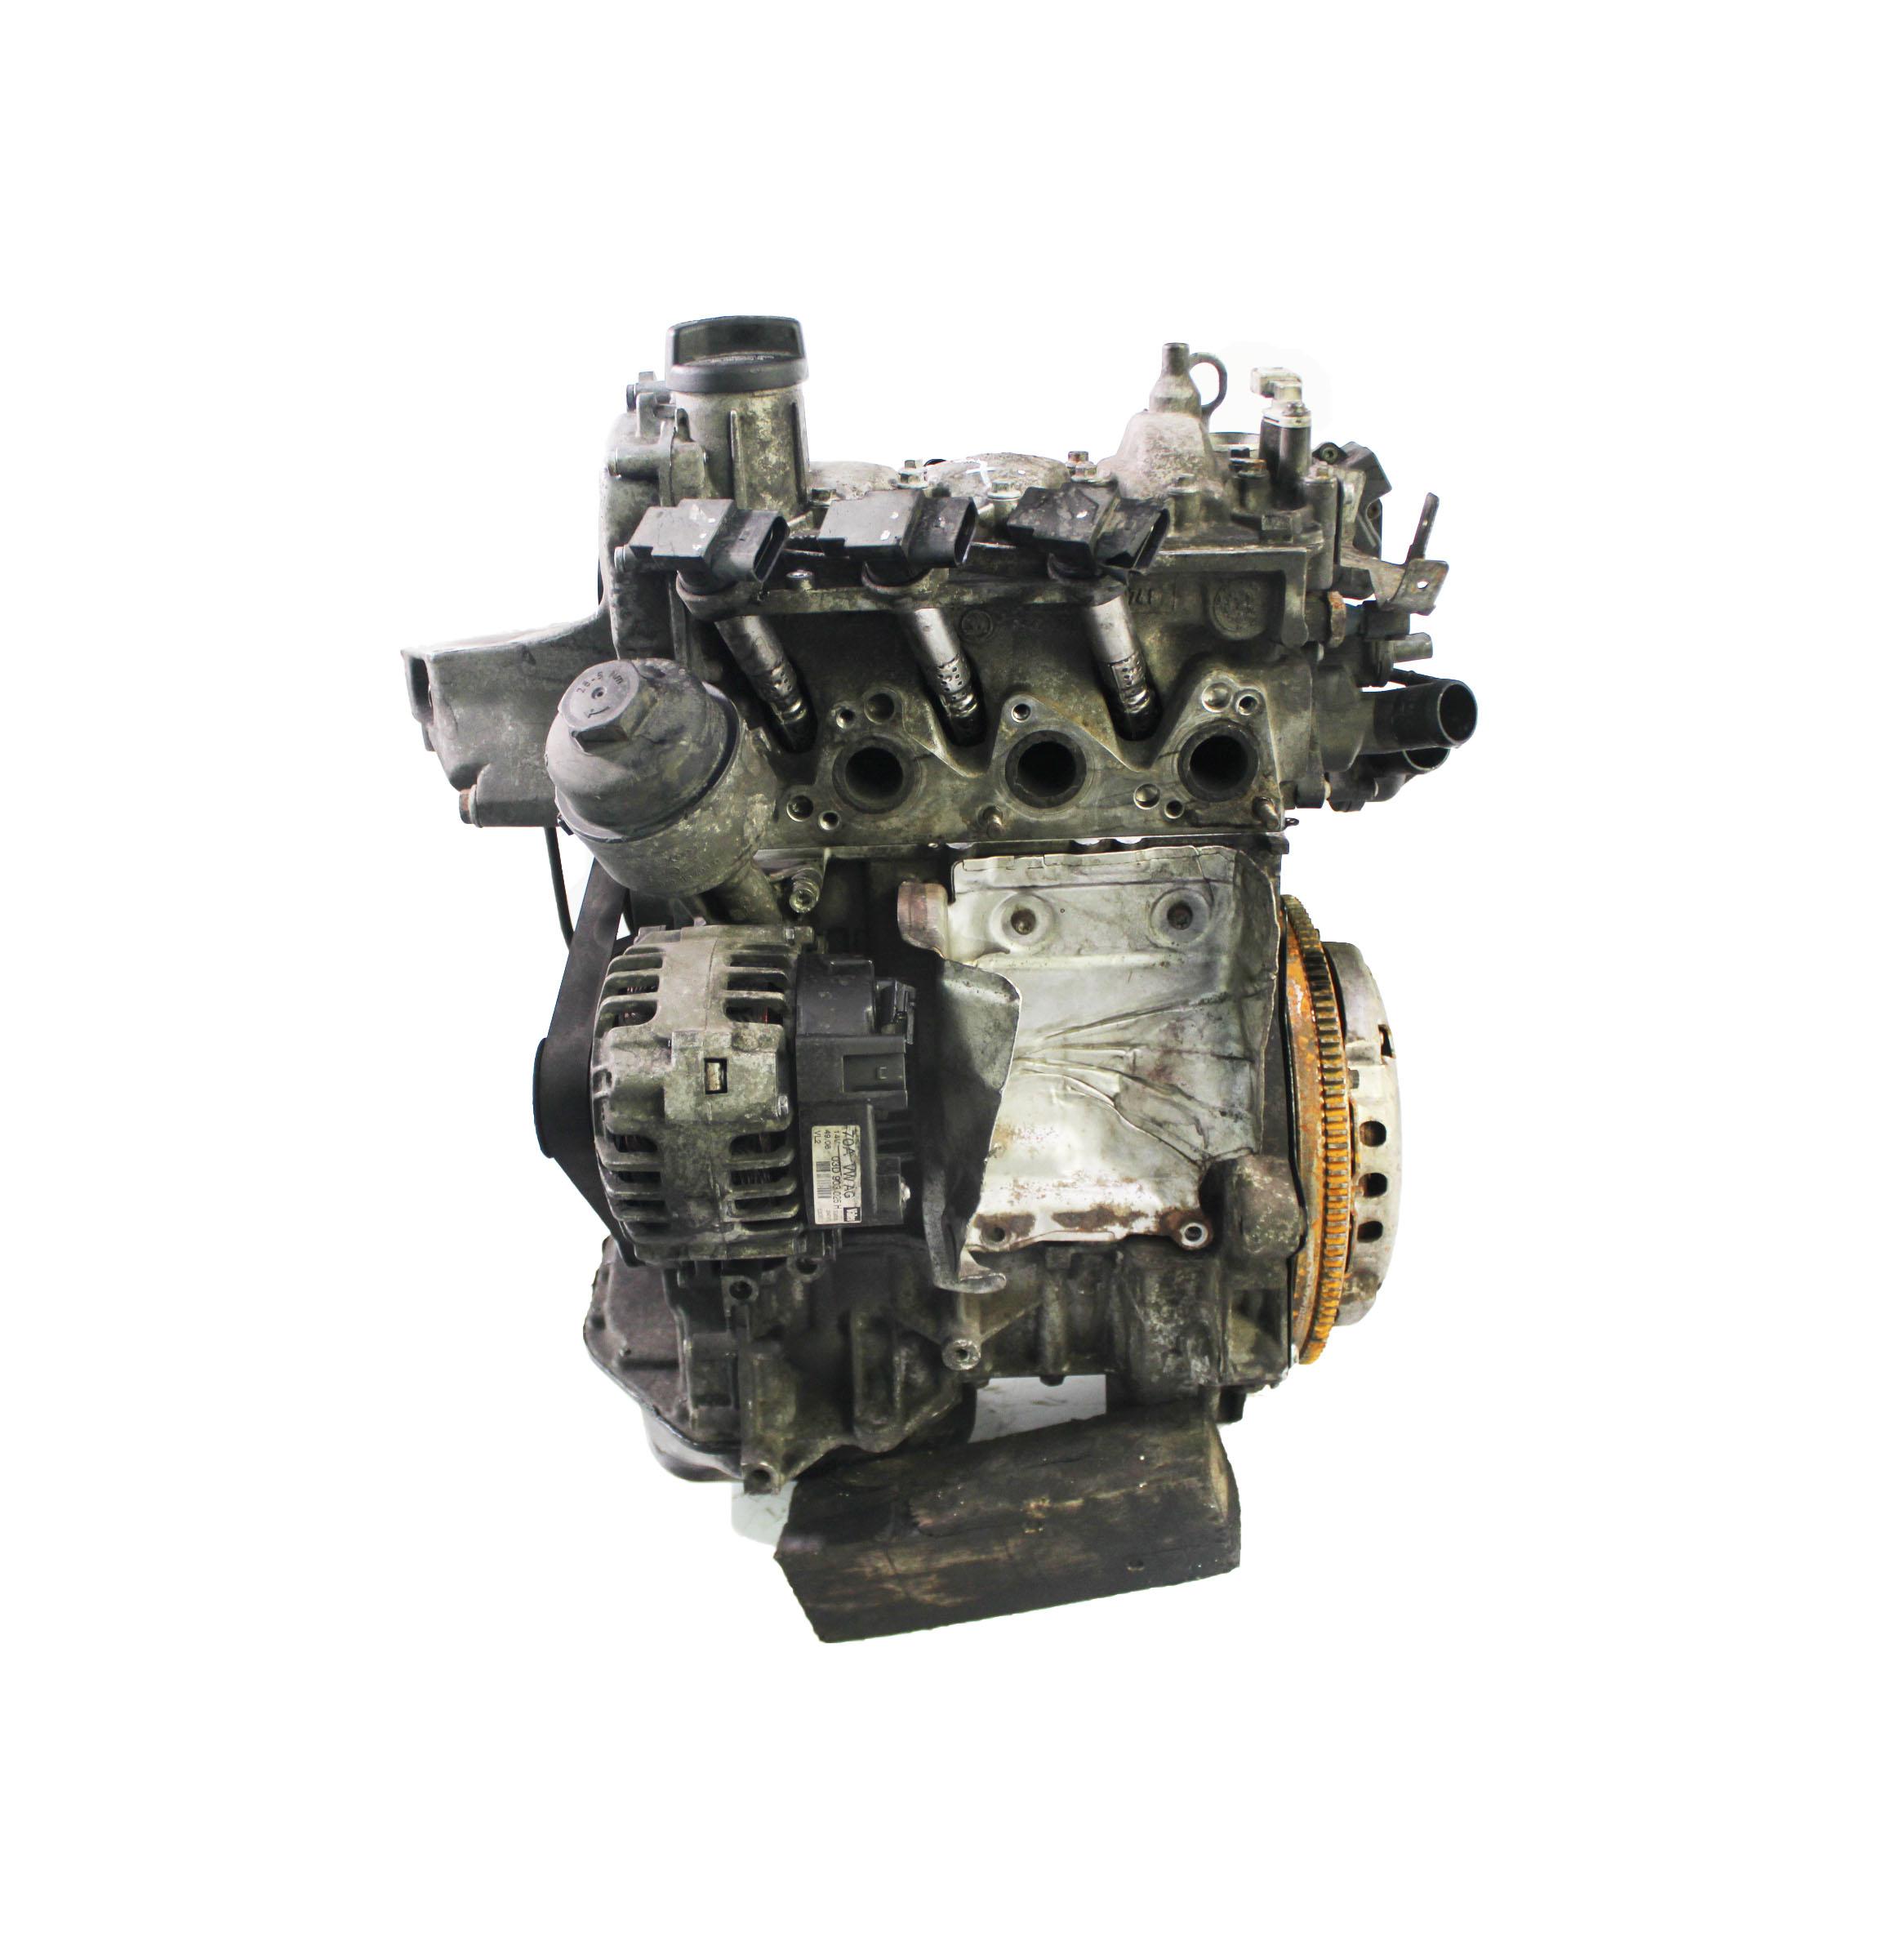 Motor für VW Polo 9N 1,2 Benzin BMD 54 PS 40 KW